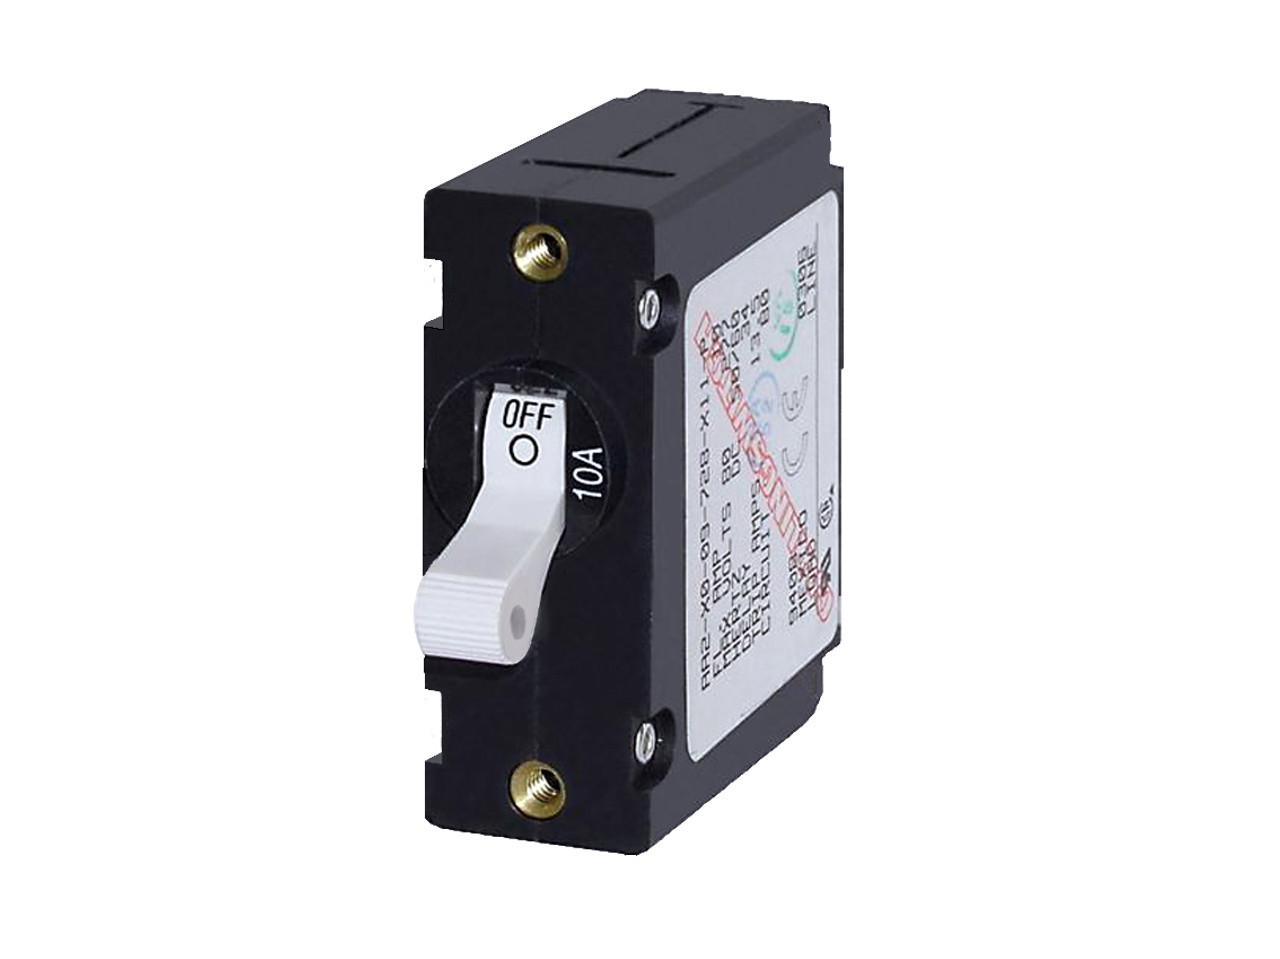 Circuit Breaker Amperage Gt 20 Amps Gt Blue Sea 7213 Single Pole Circuit